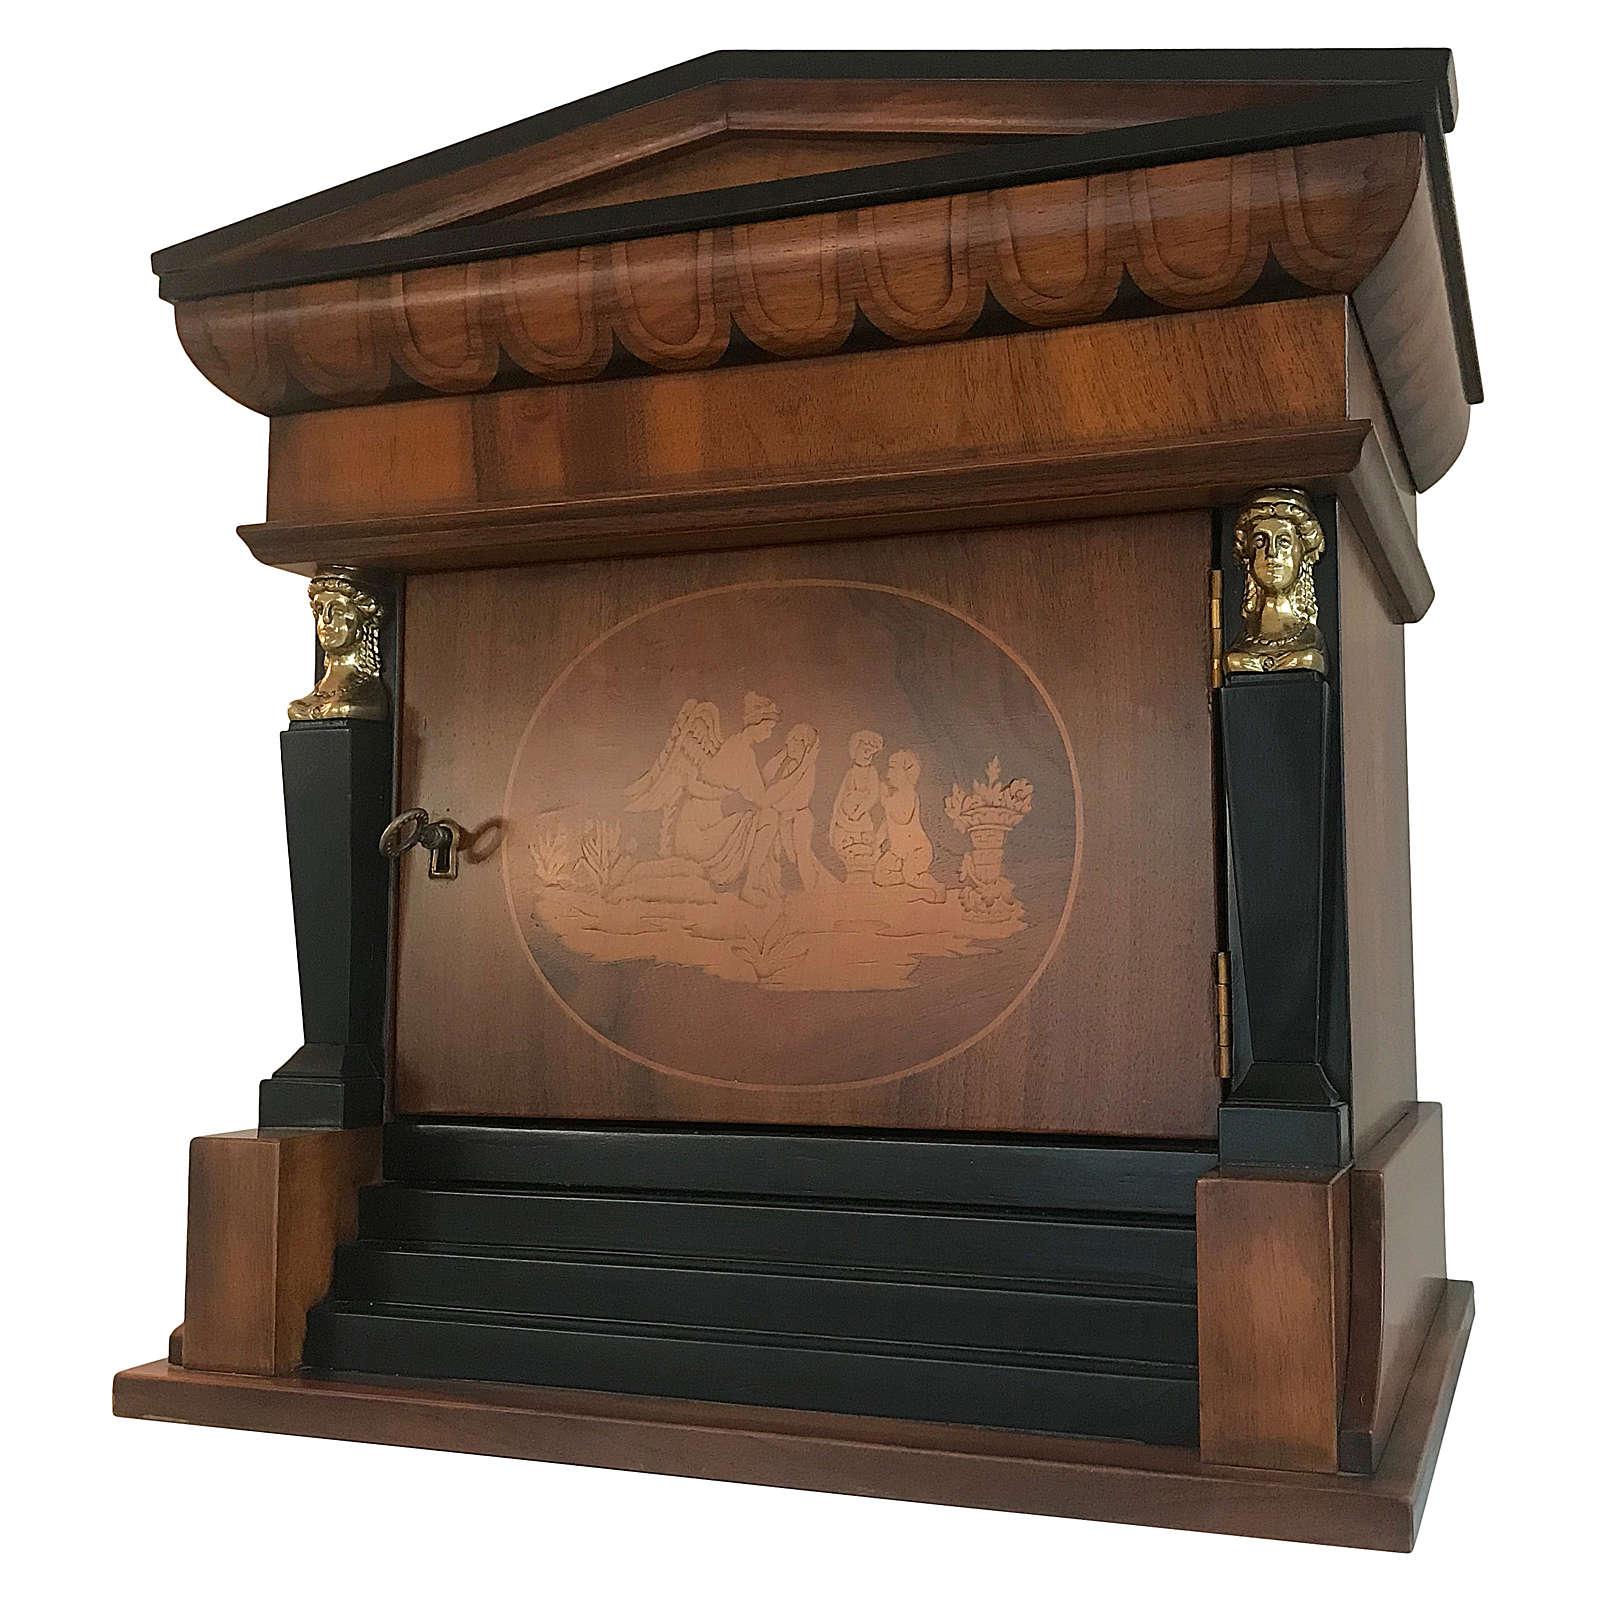 Urna cineraria Tempio mogano verniciato per 2 urne 3